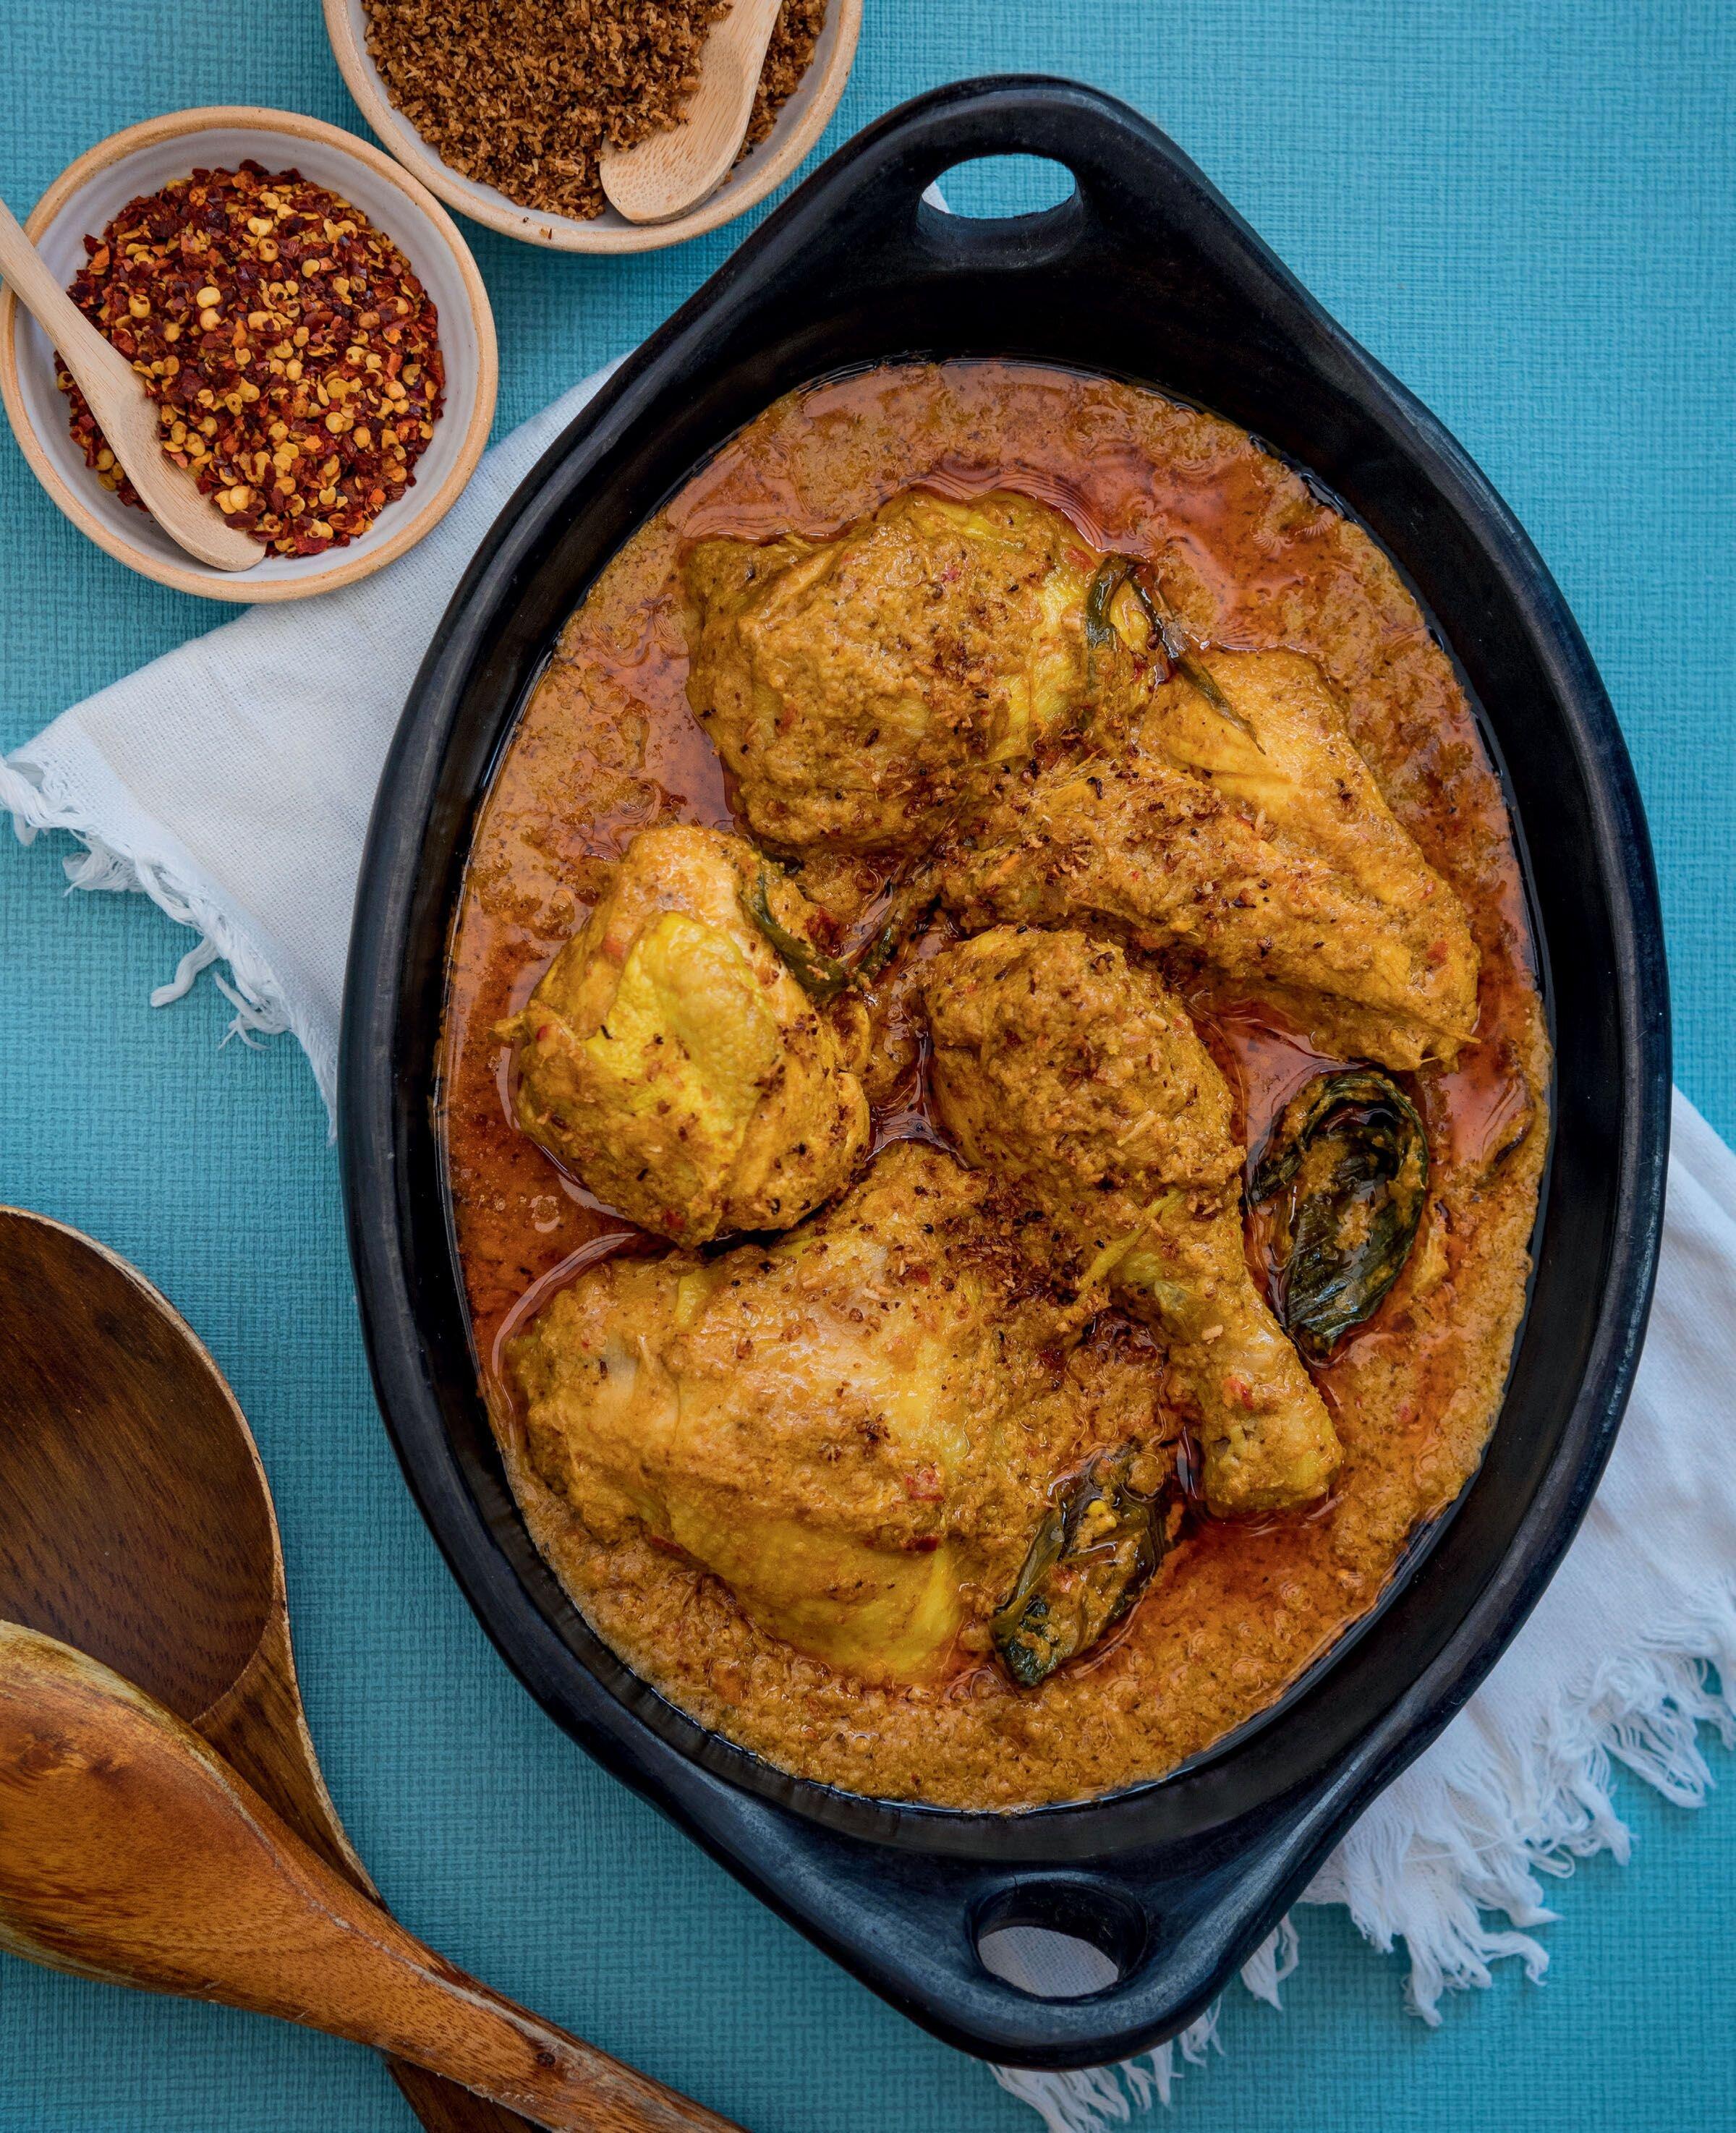 Zaleha's special 'Non-Crispy' Chicken Rendang, as cooking on MasterChef